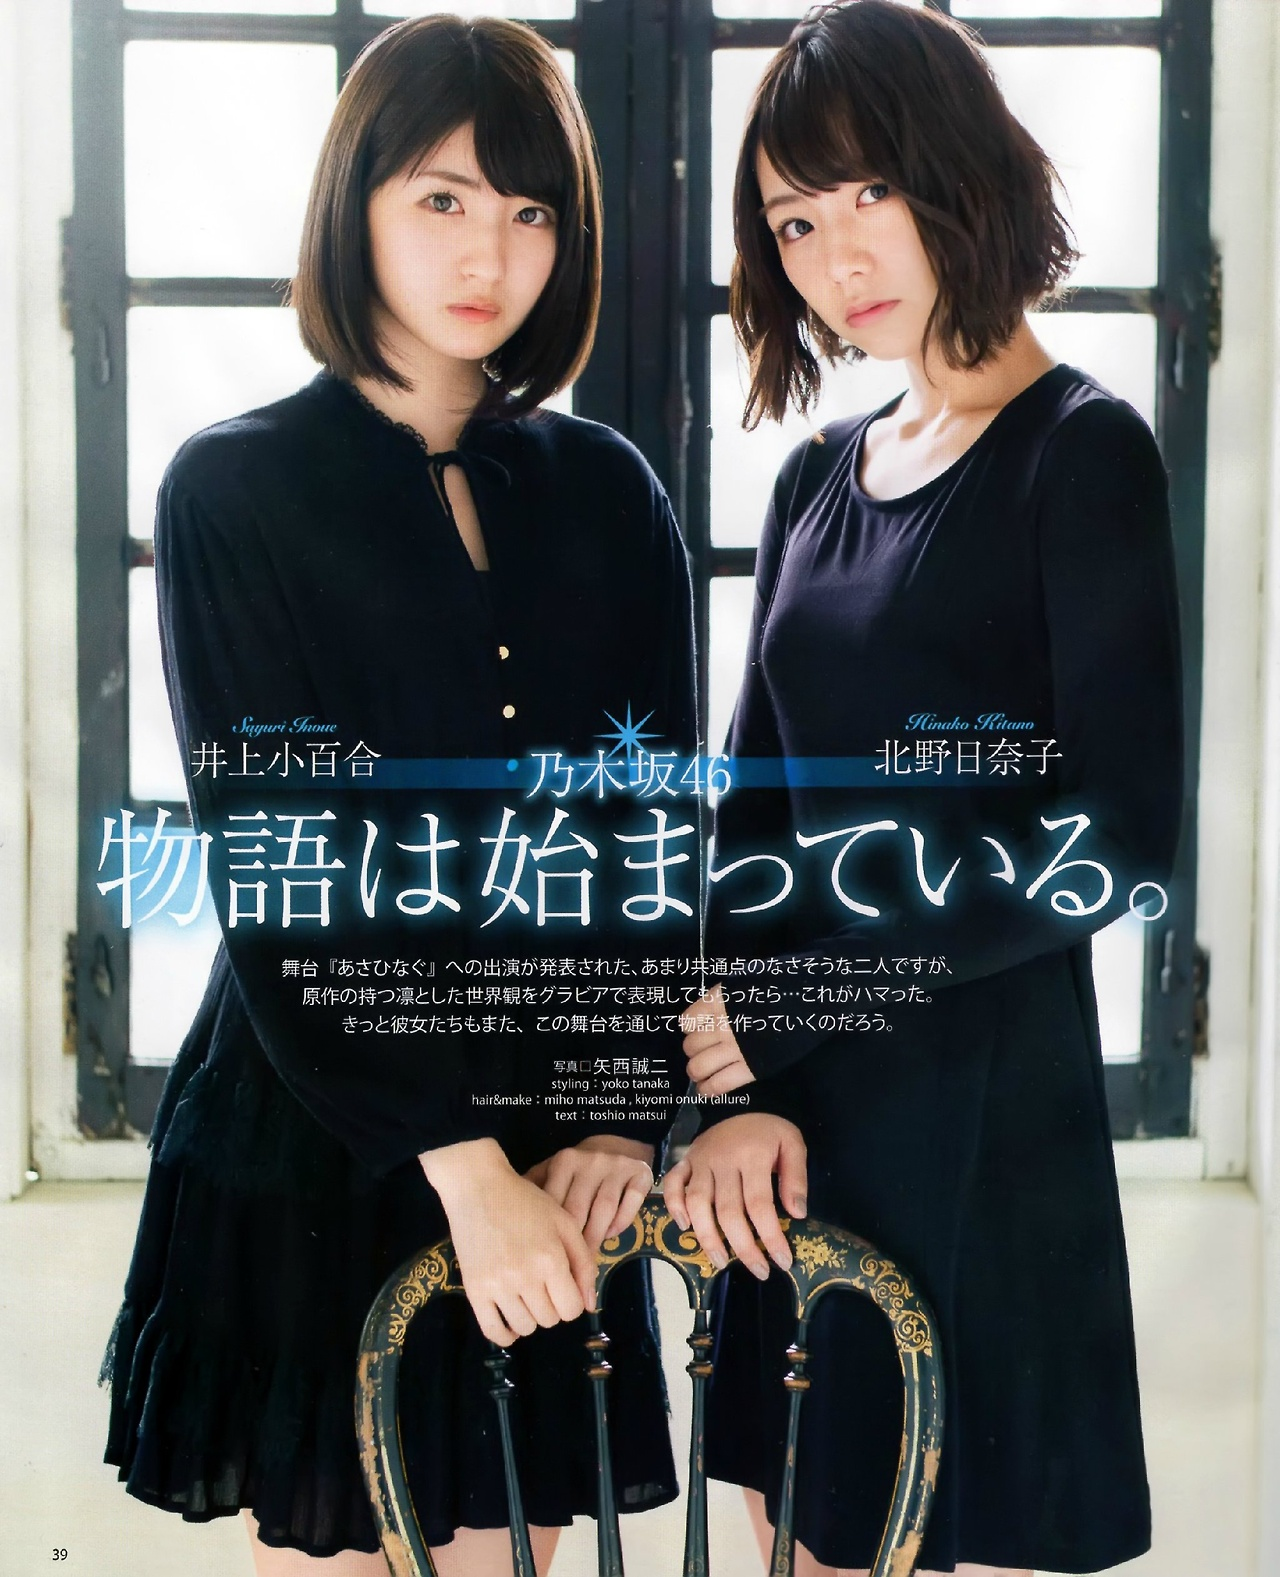 Inoue Sayuri 井上小百合, Kitano Hinako 北野日奈子 Nogizaka46, BOMB! 2017.05 (ボム 2017年05月号)